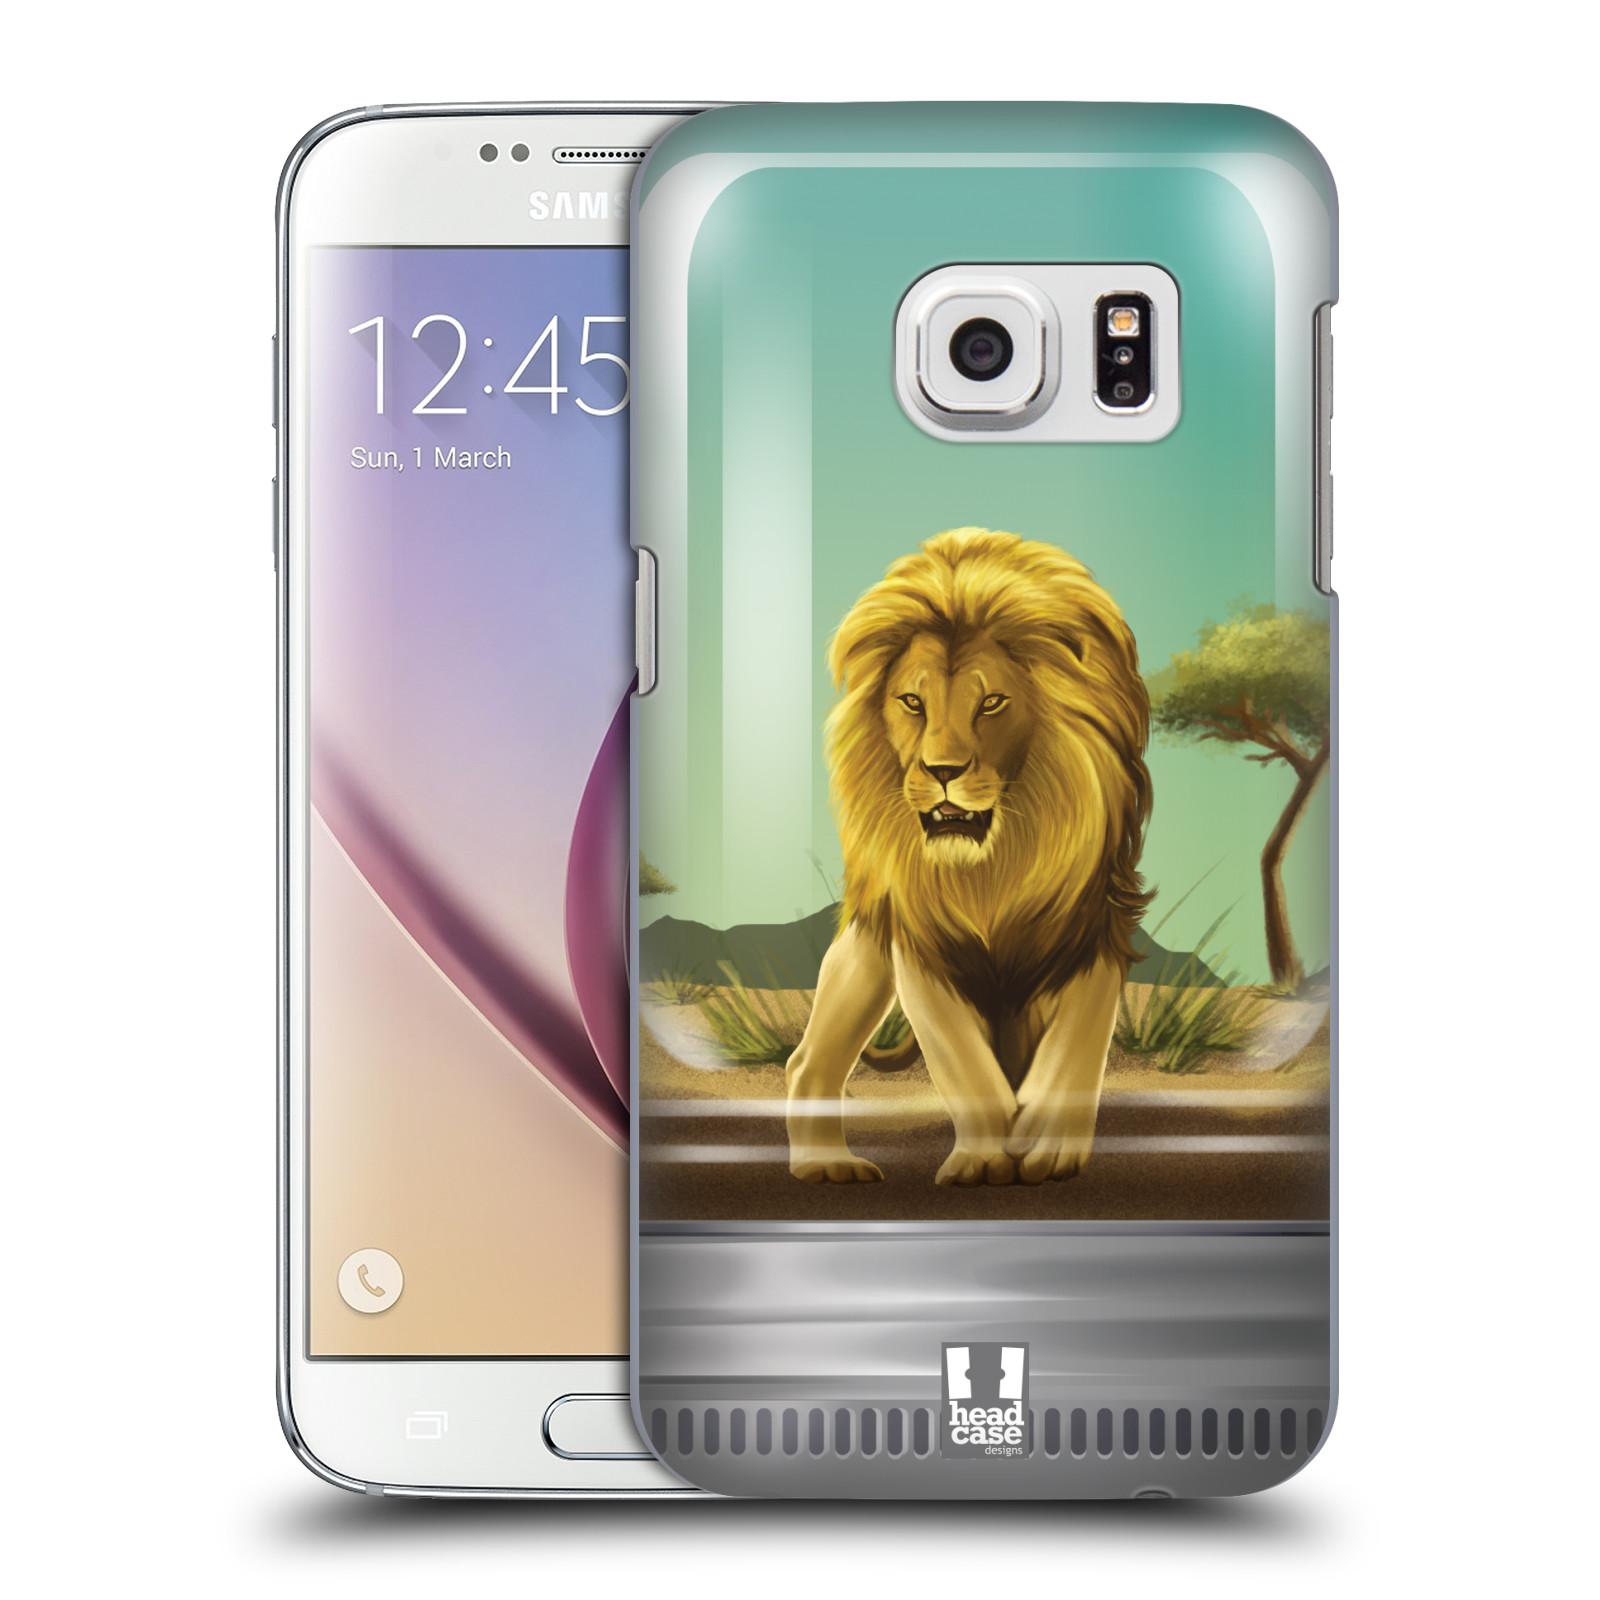 HEAD CASE plastový obal na mobil SAMSUNG GALAXY S7 vzor Zvířátka v těžítku lev